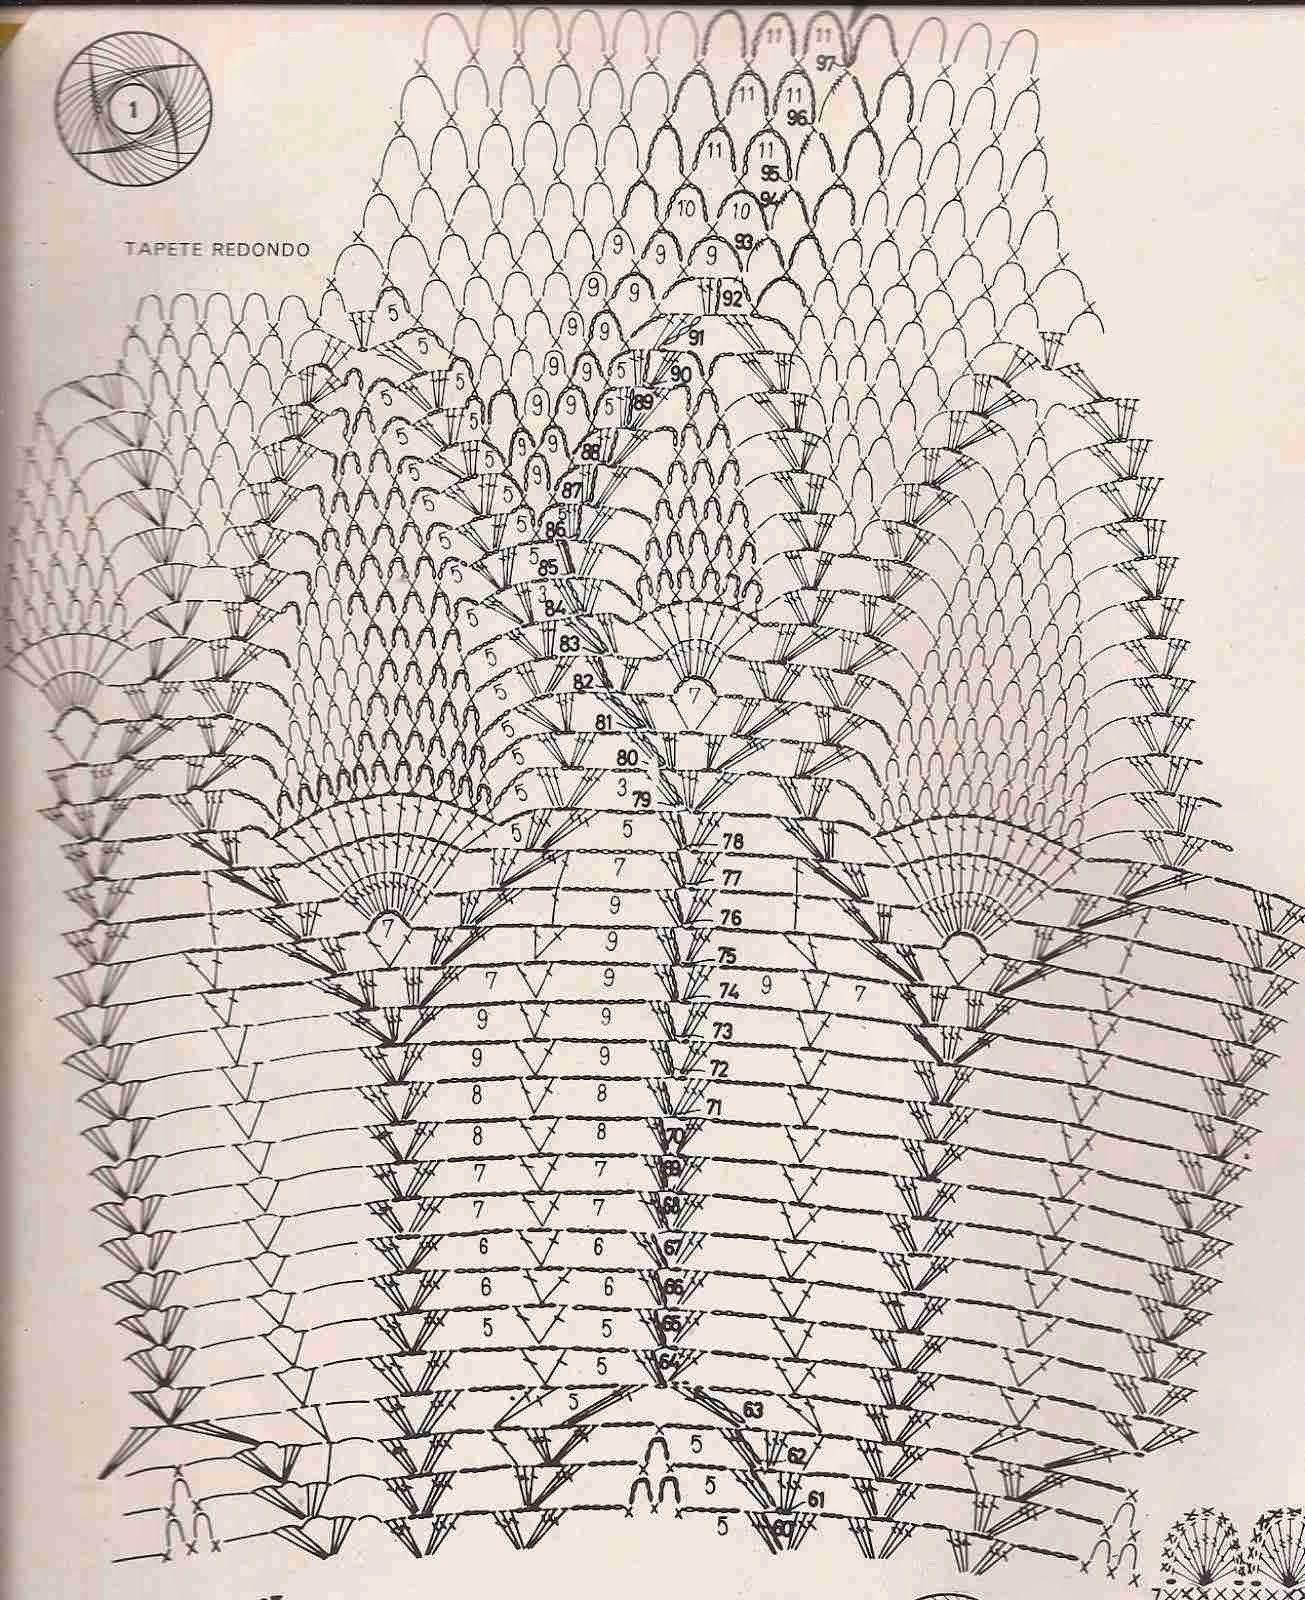 #1 Tapete Redondo a Crochet